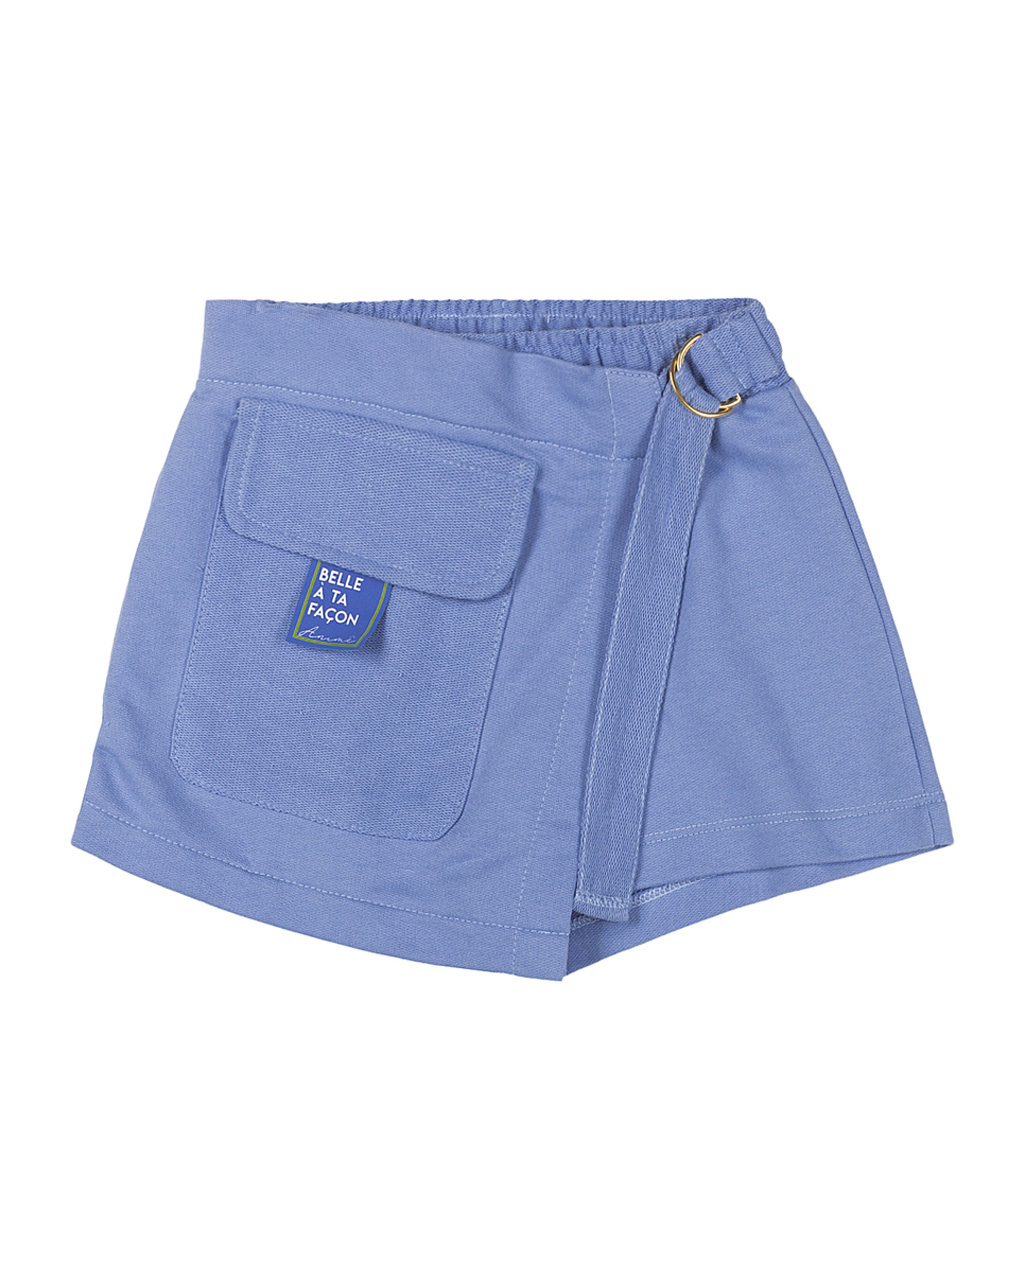 Shorts Saia Infantil Moletom Bolso na Frente Animê